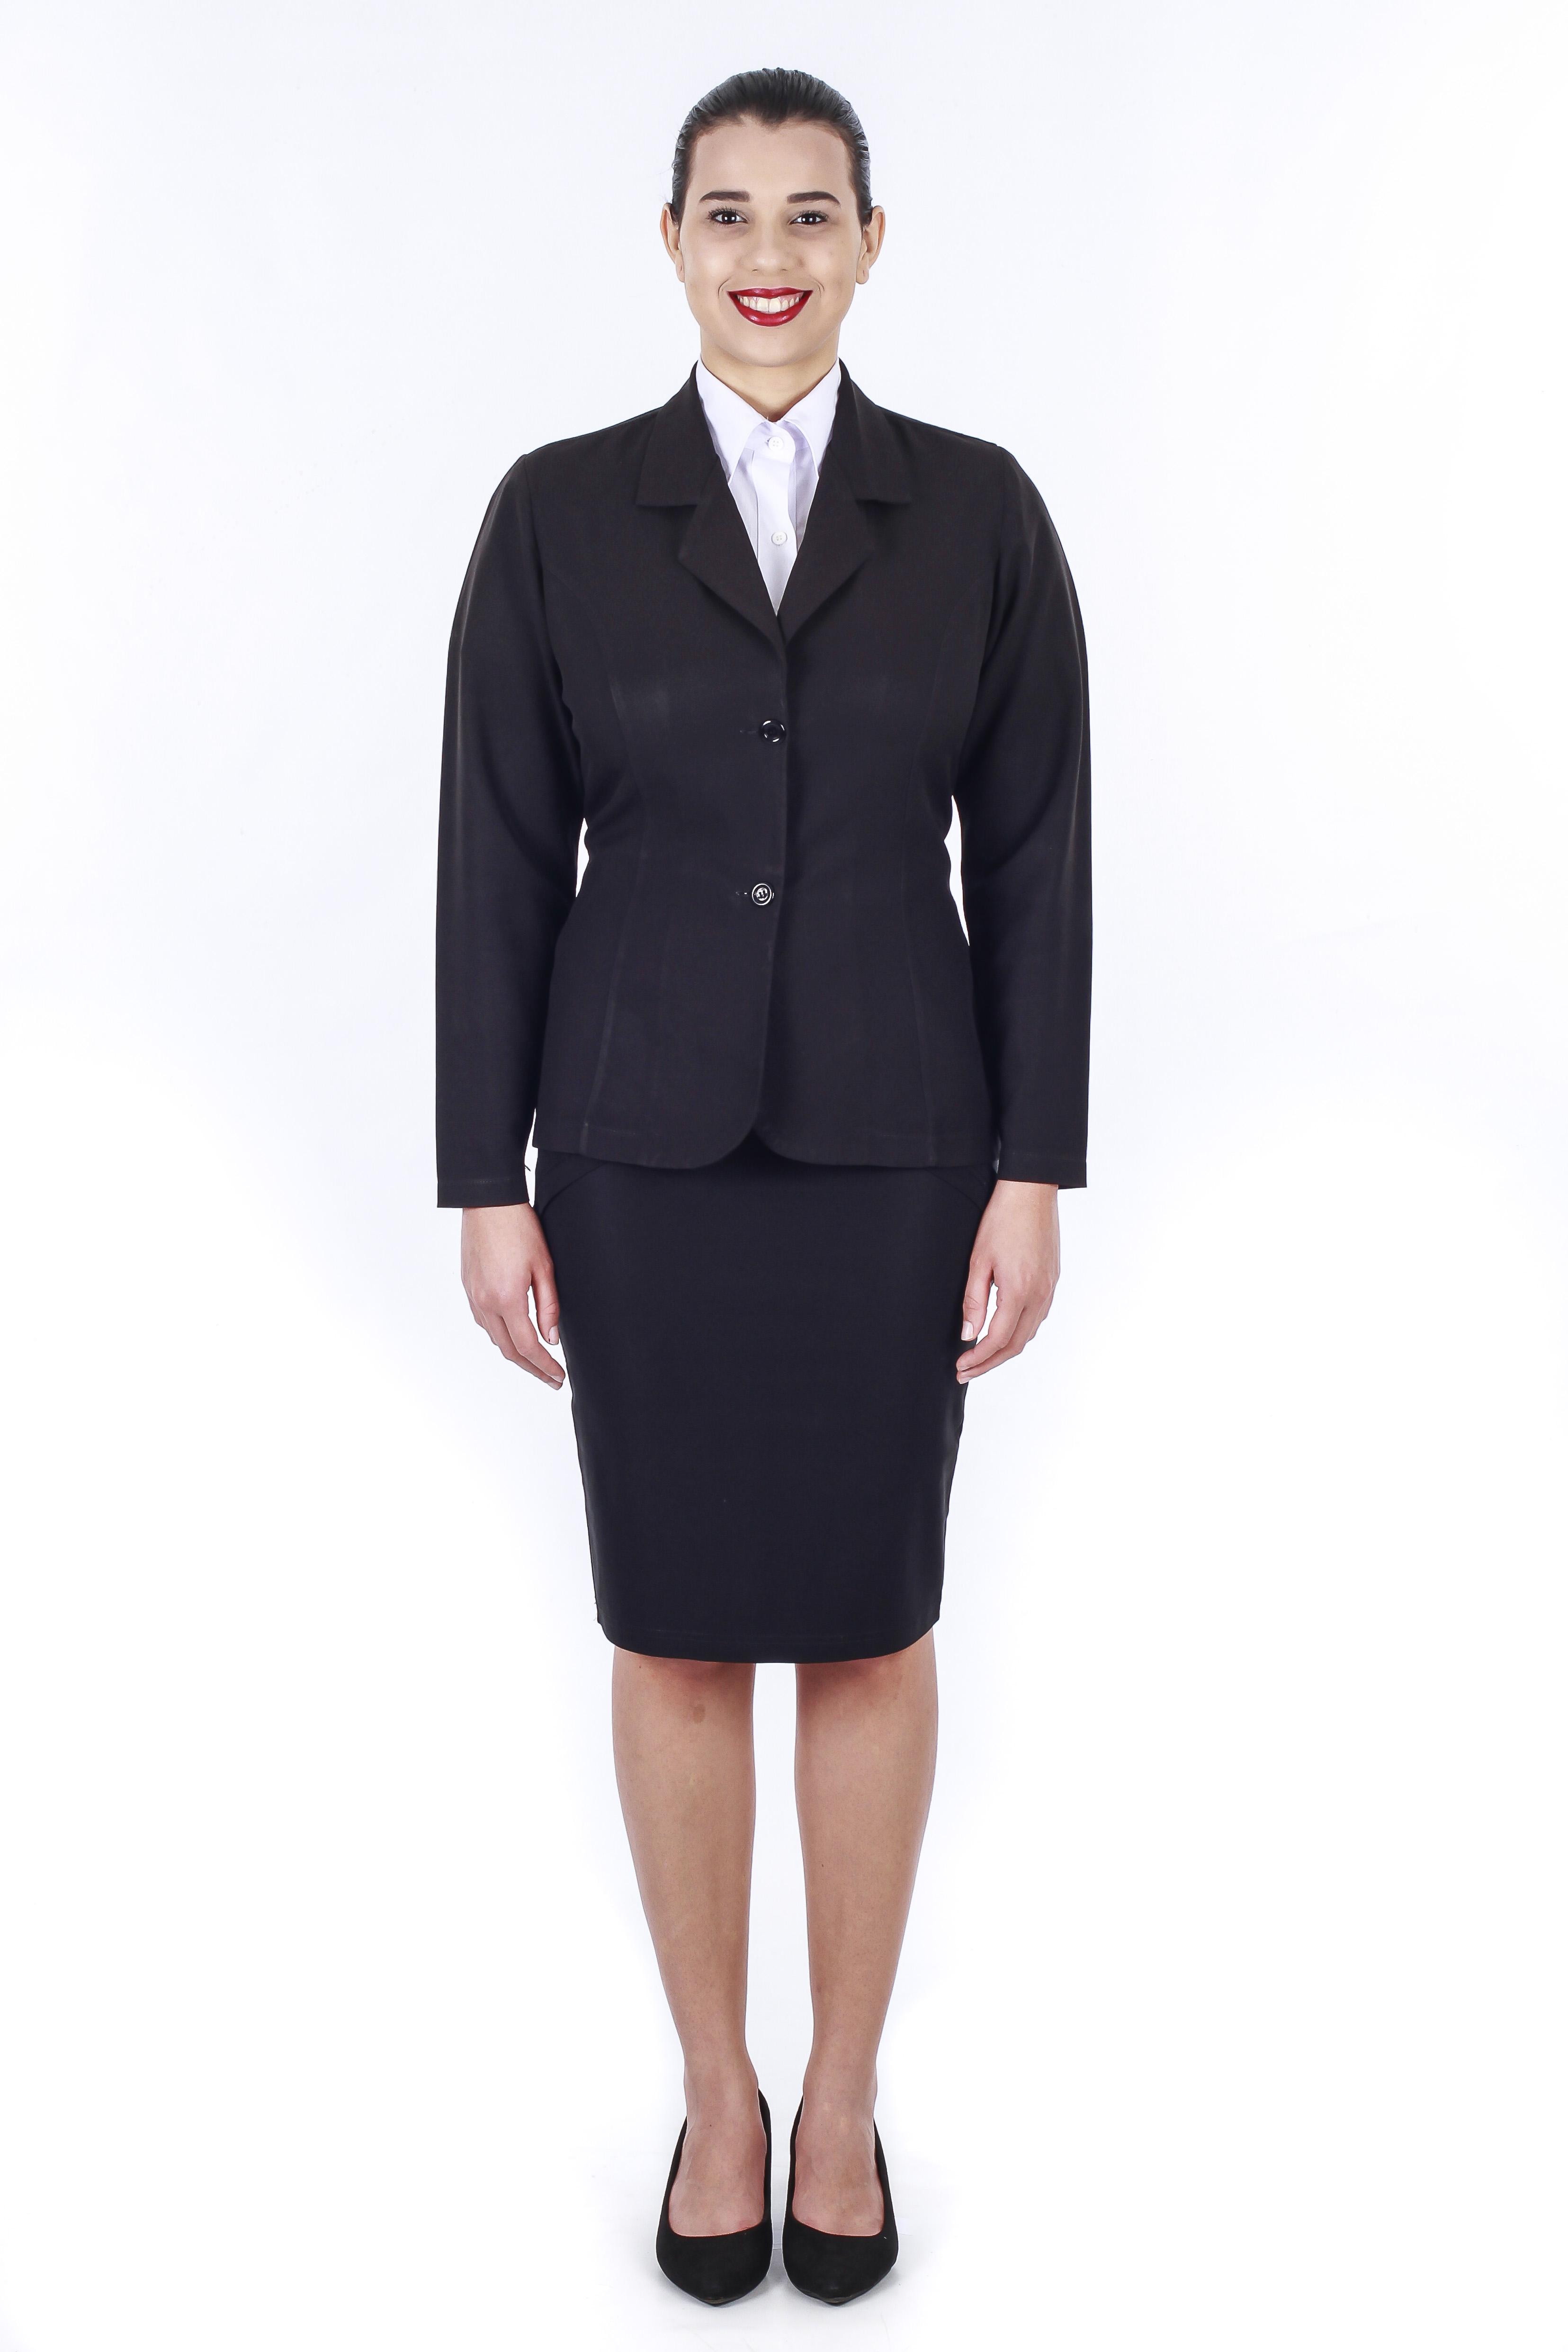 Brenda comissária-3